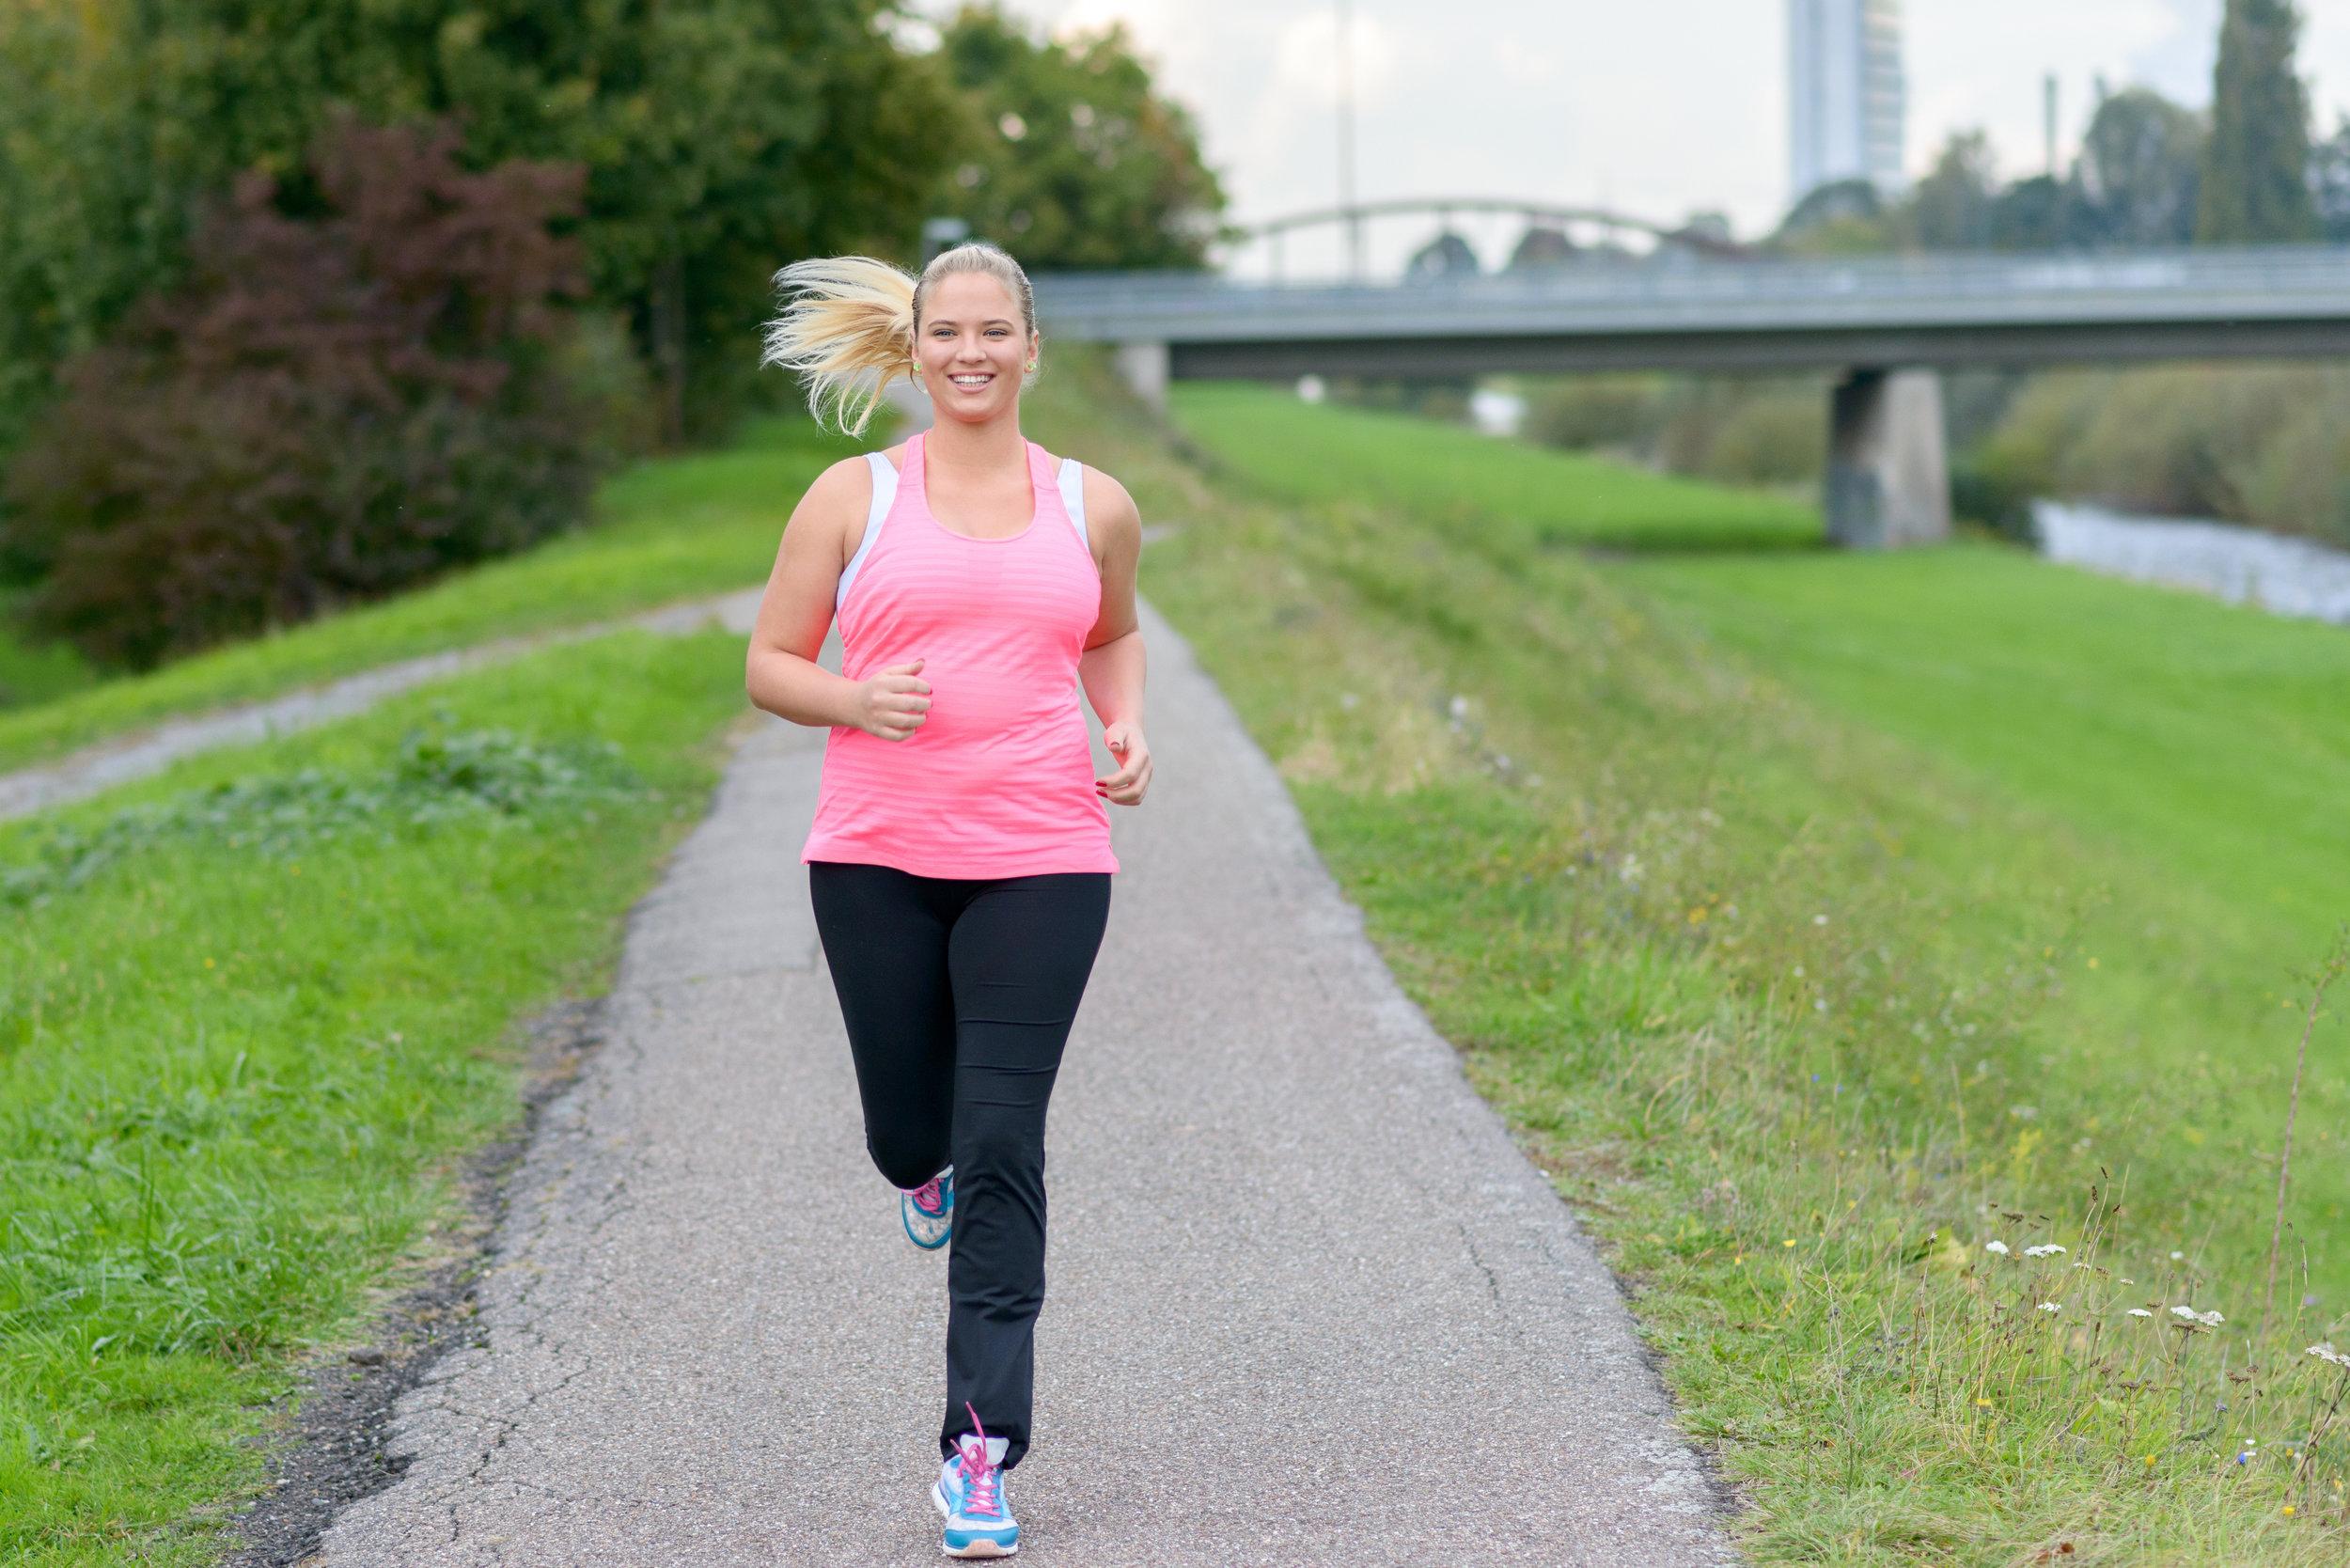 BB Image Woman Jogging slightly overweight.jpg